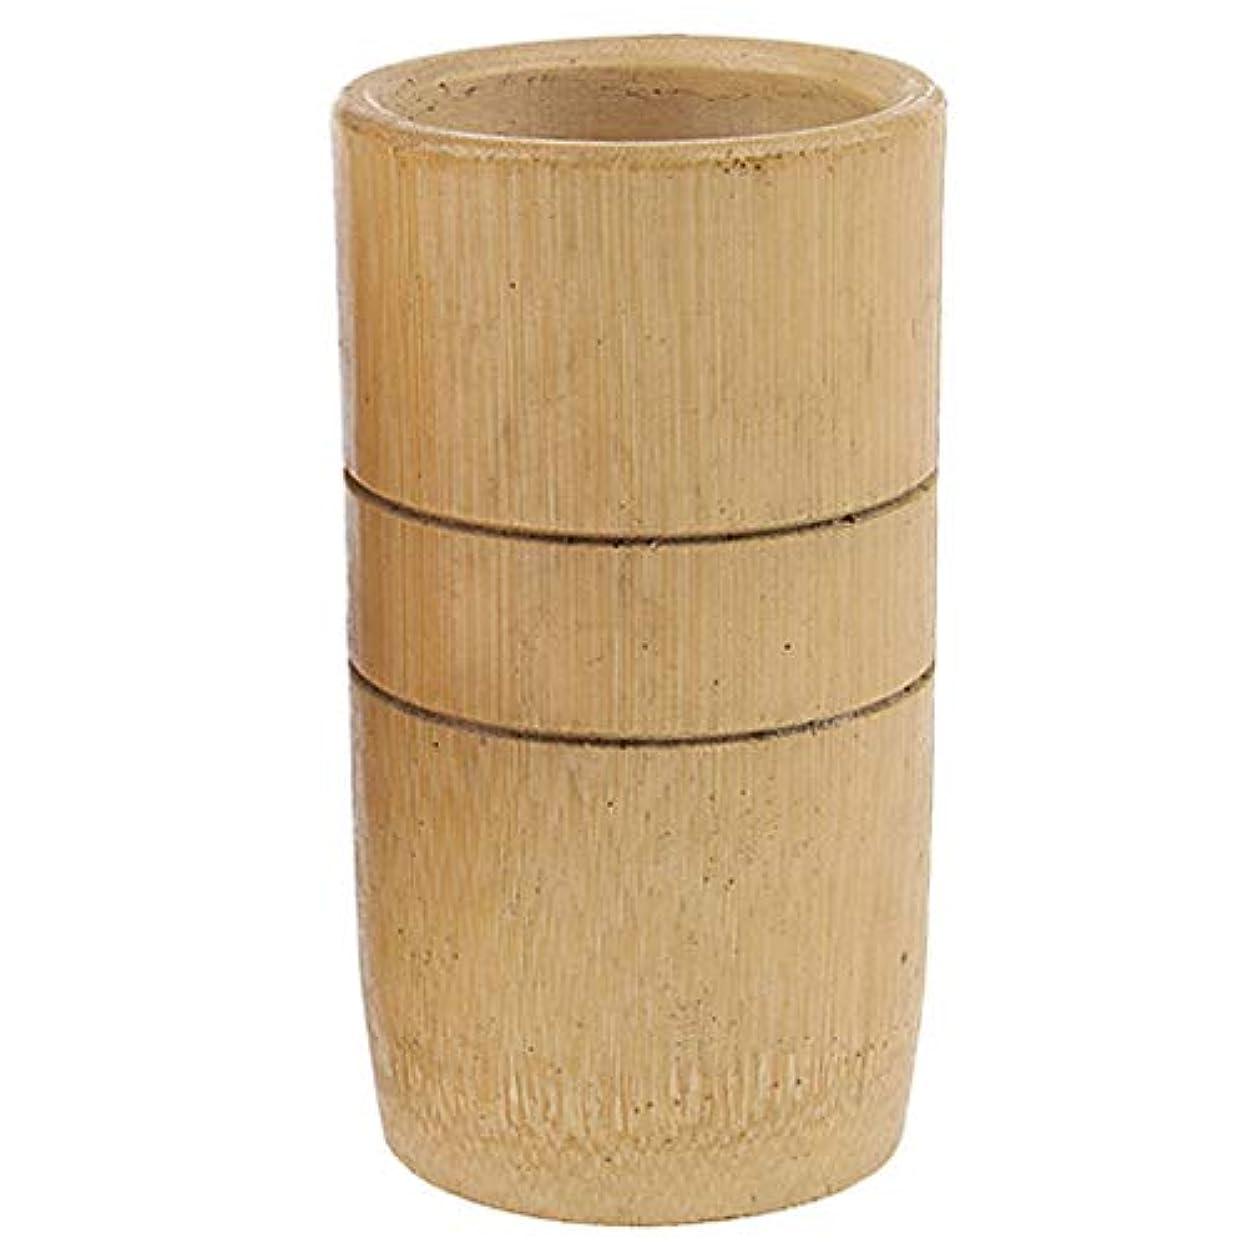 Hellery 2個 マッサージ吸い玉 カッピング 天然竹製 全身マッサージ用 血流促進